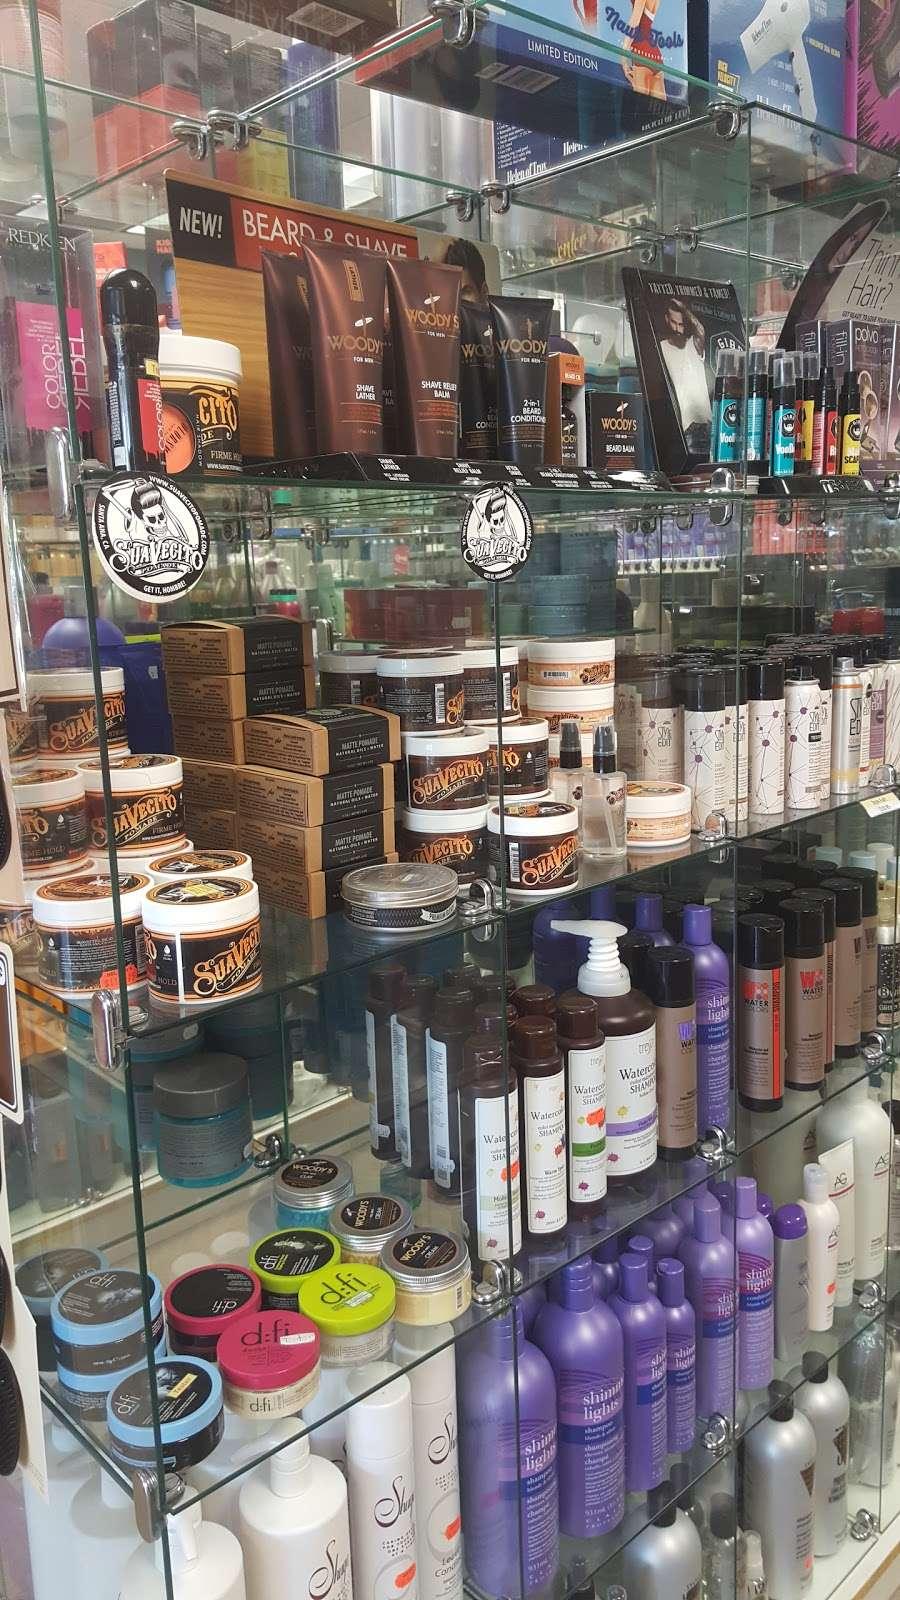 Helens Beauty Supply & Salon - hair care  | Photo 4 of 9 | Address: 15760 La Forge St, Whittier, CA 90603, USA | Phone: (562) 943-7313